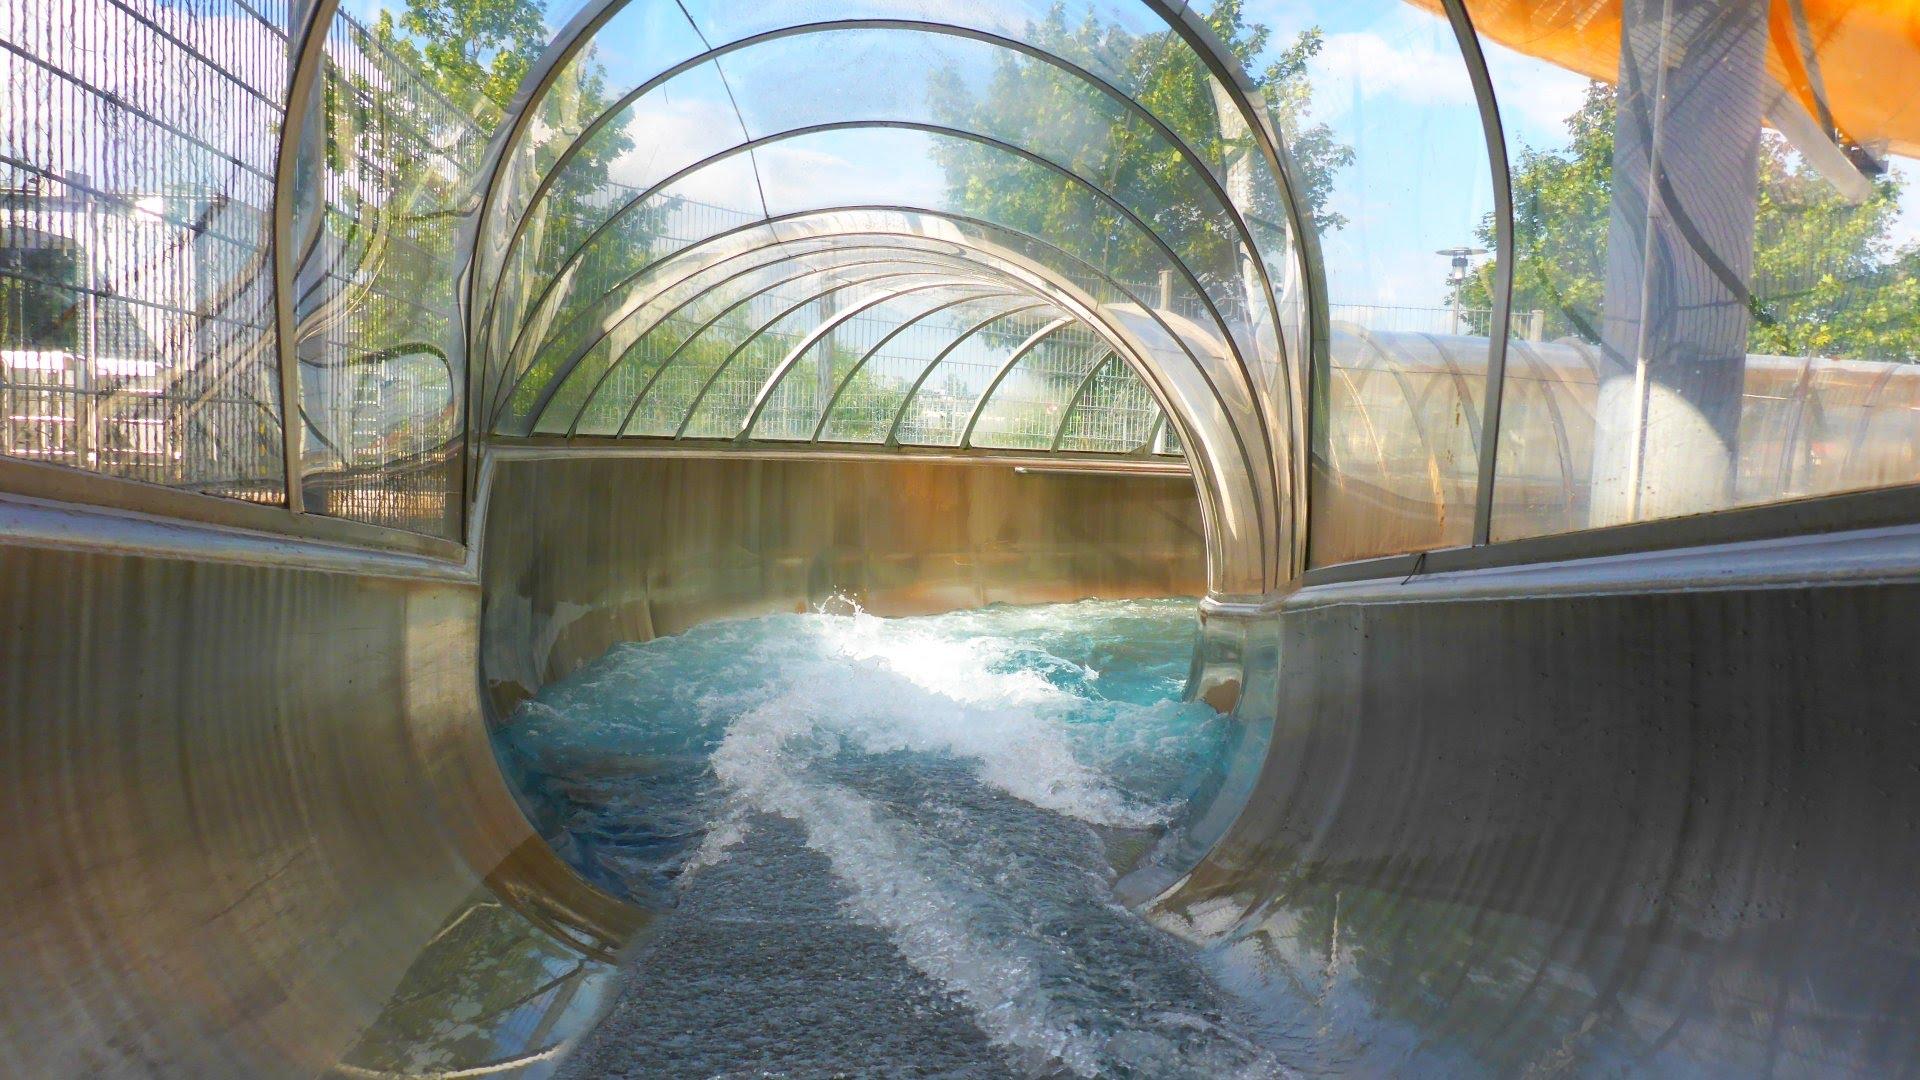 Crazy River Reifenrutsche :: Rafting Slide   CamboMare Kempten